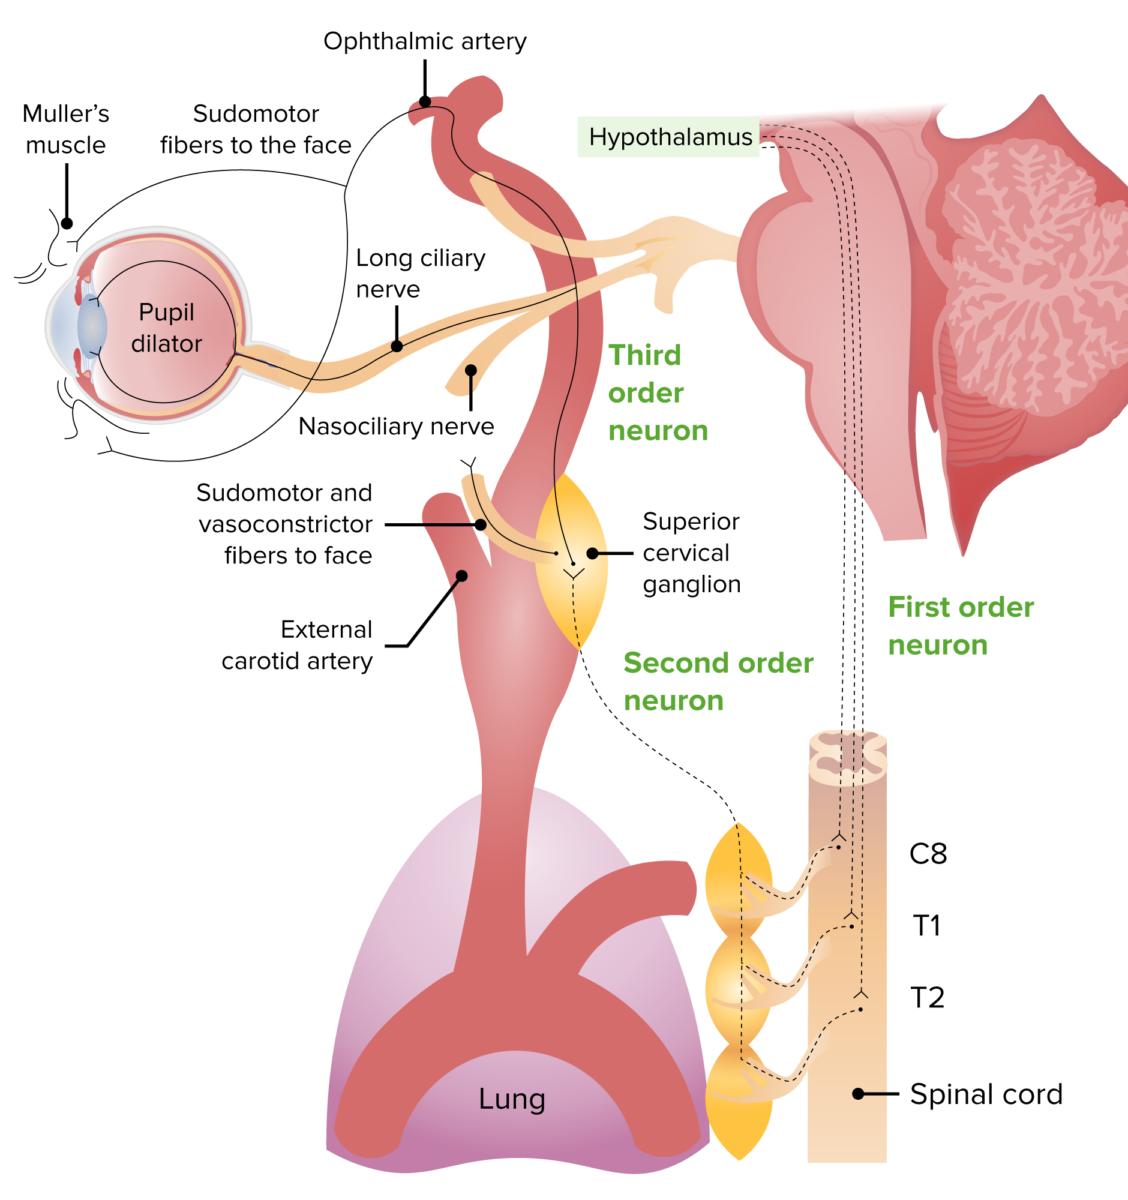 Sympathetic innervation pathway